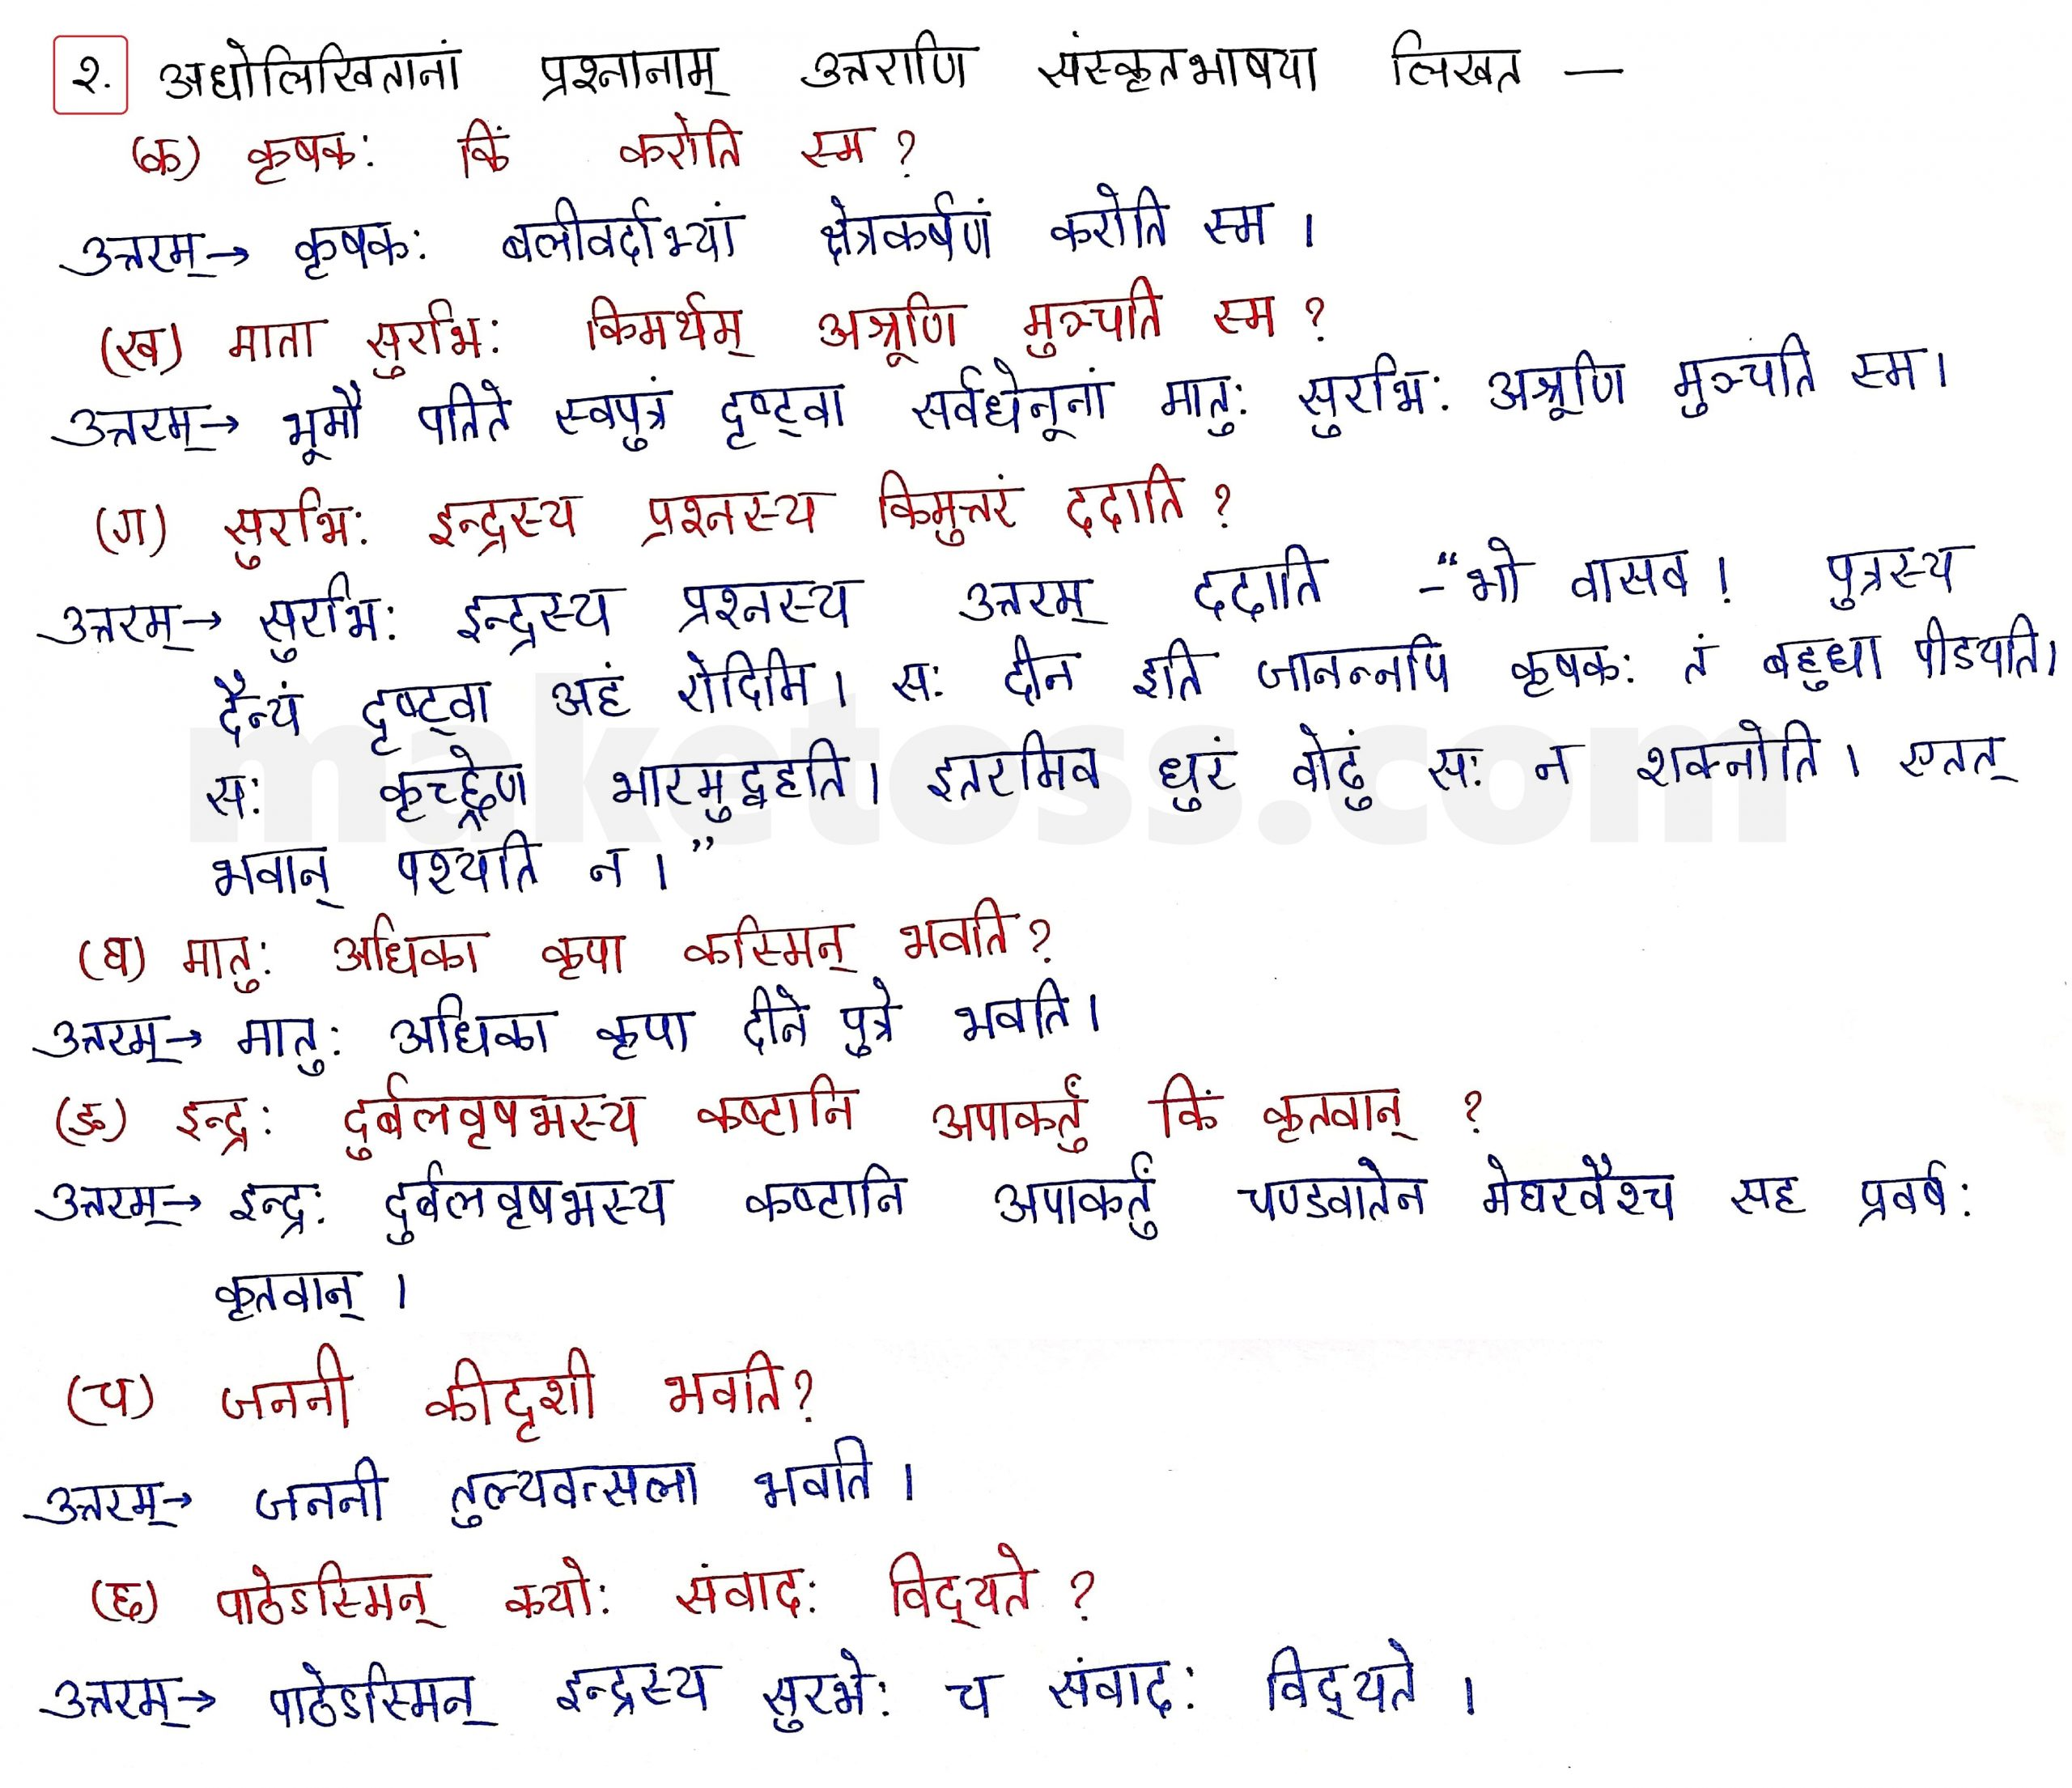 Sanskrit Class 10 - Chapter 5 - जननी तुल्यवत्सला  - Question 2 with Answer